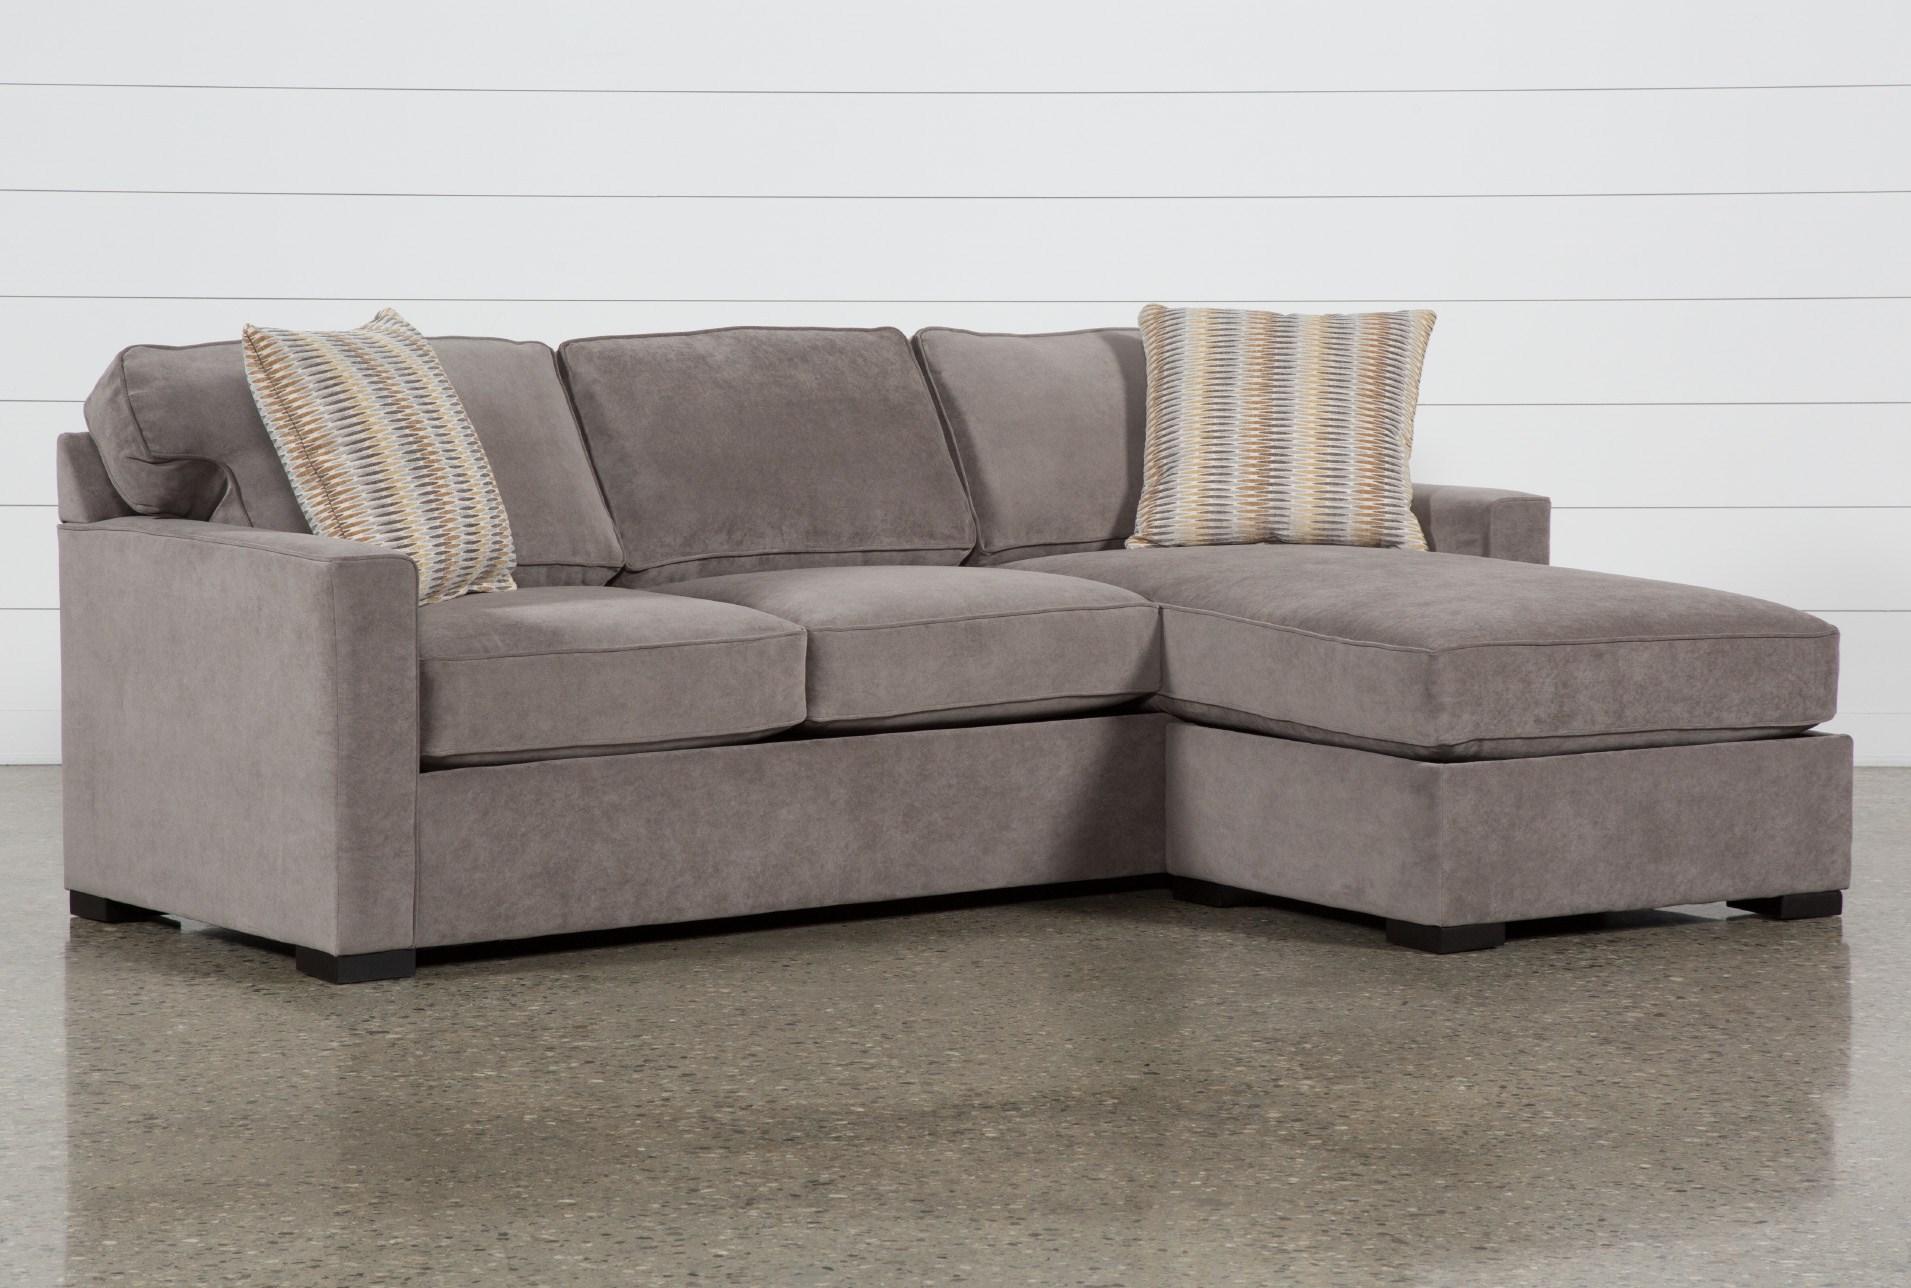 Sofa Chaise Sleeper, How To Dispose Of A Sleeper Sofa